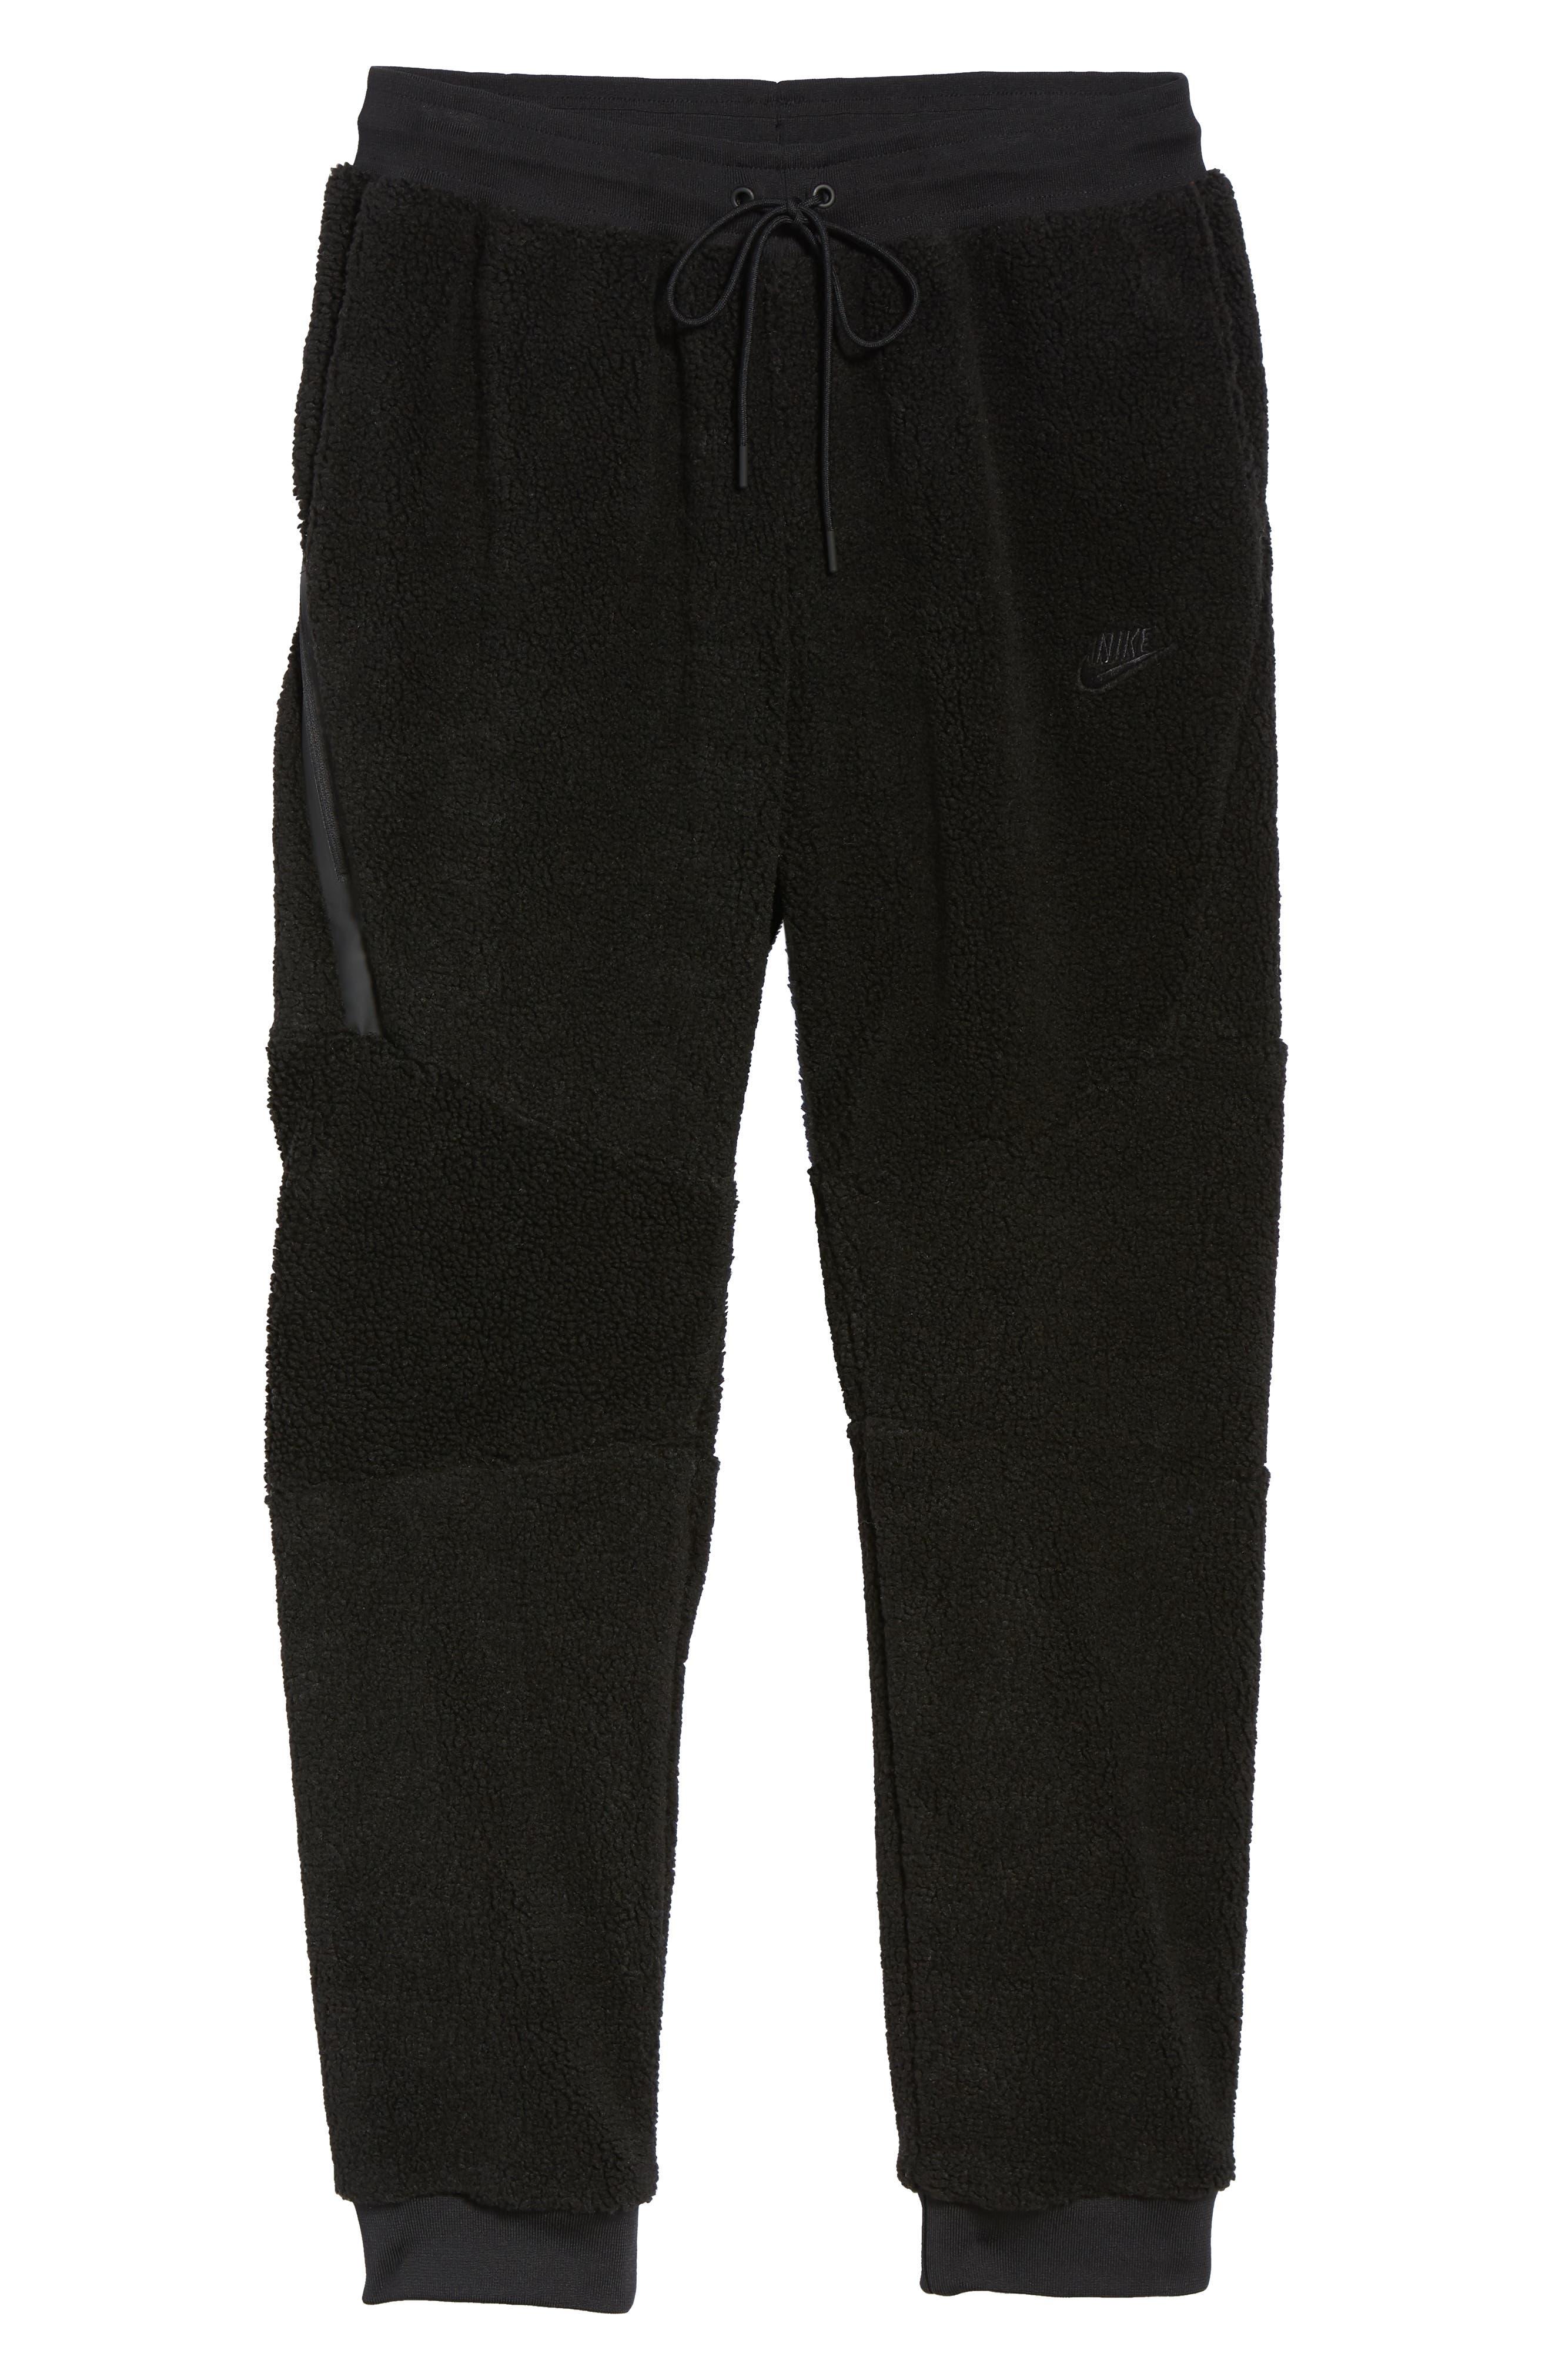 NIKE, Sportswear Tech Fleece Icon Jogger Pants, Alternate thumbnail 7, color, 010